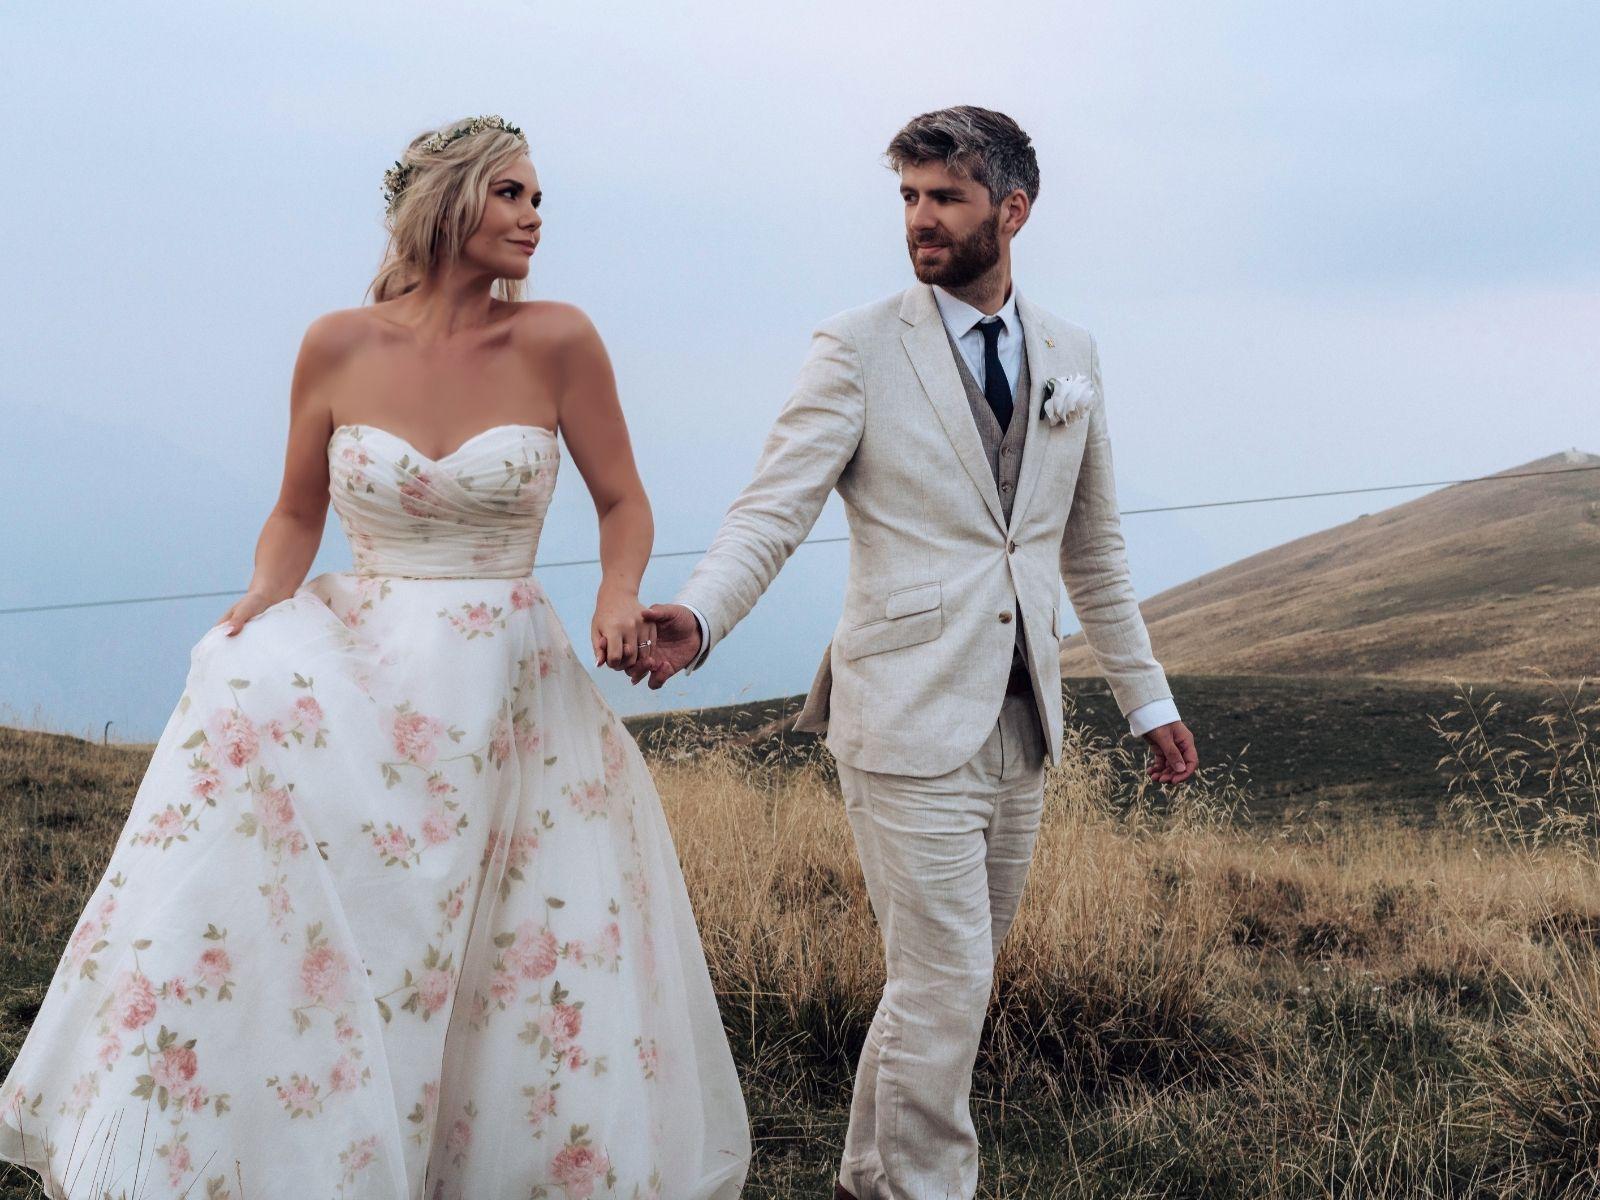 Wedding dress alterations Stratford Upon Avon, UK